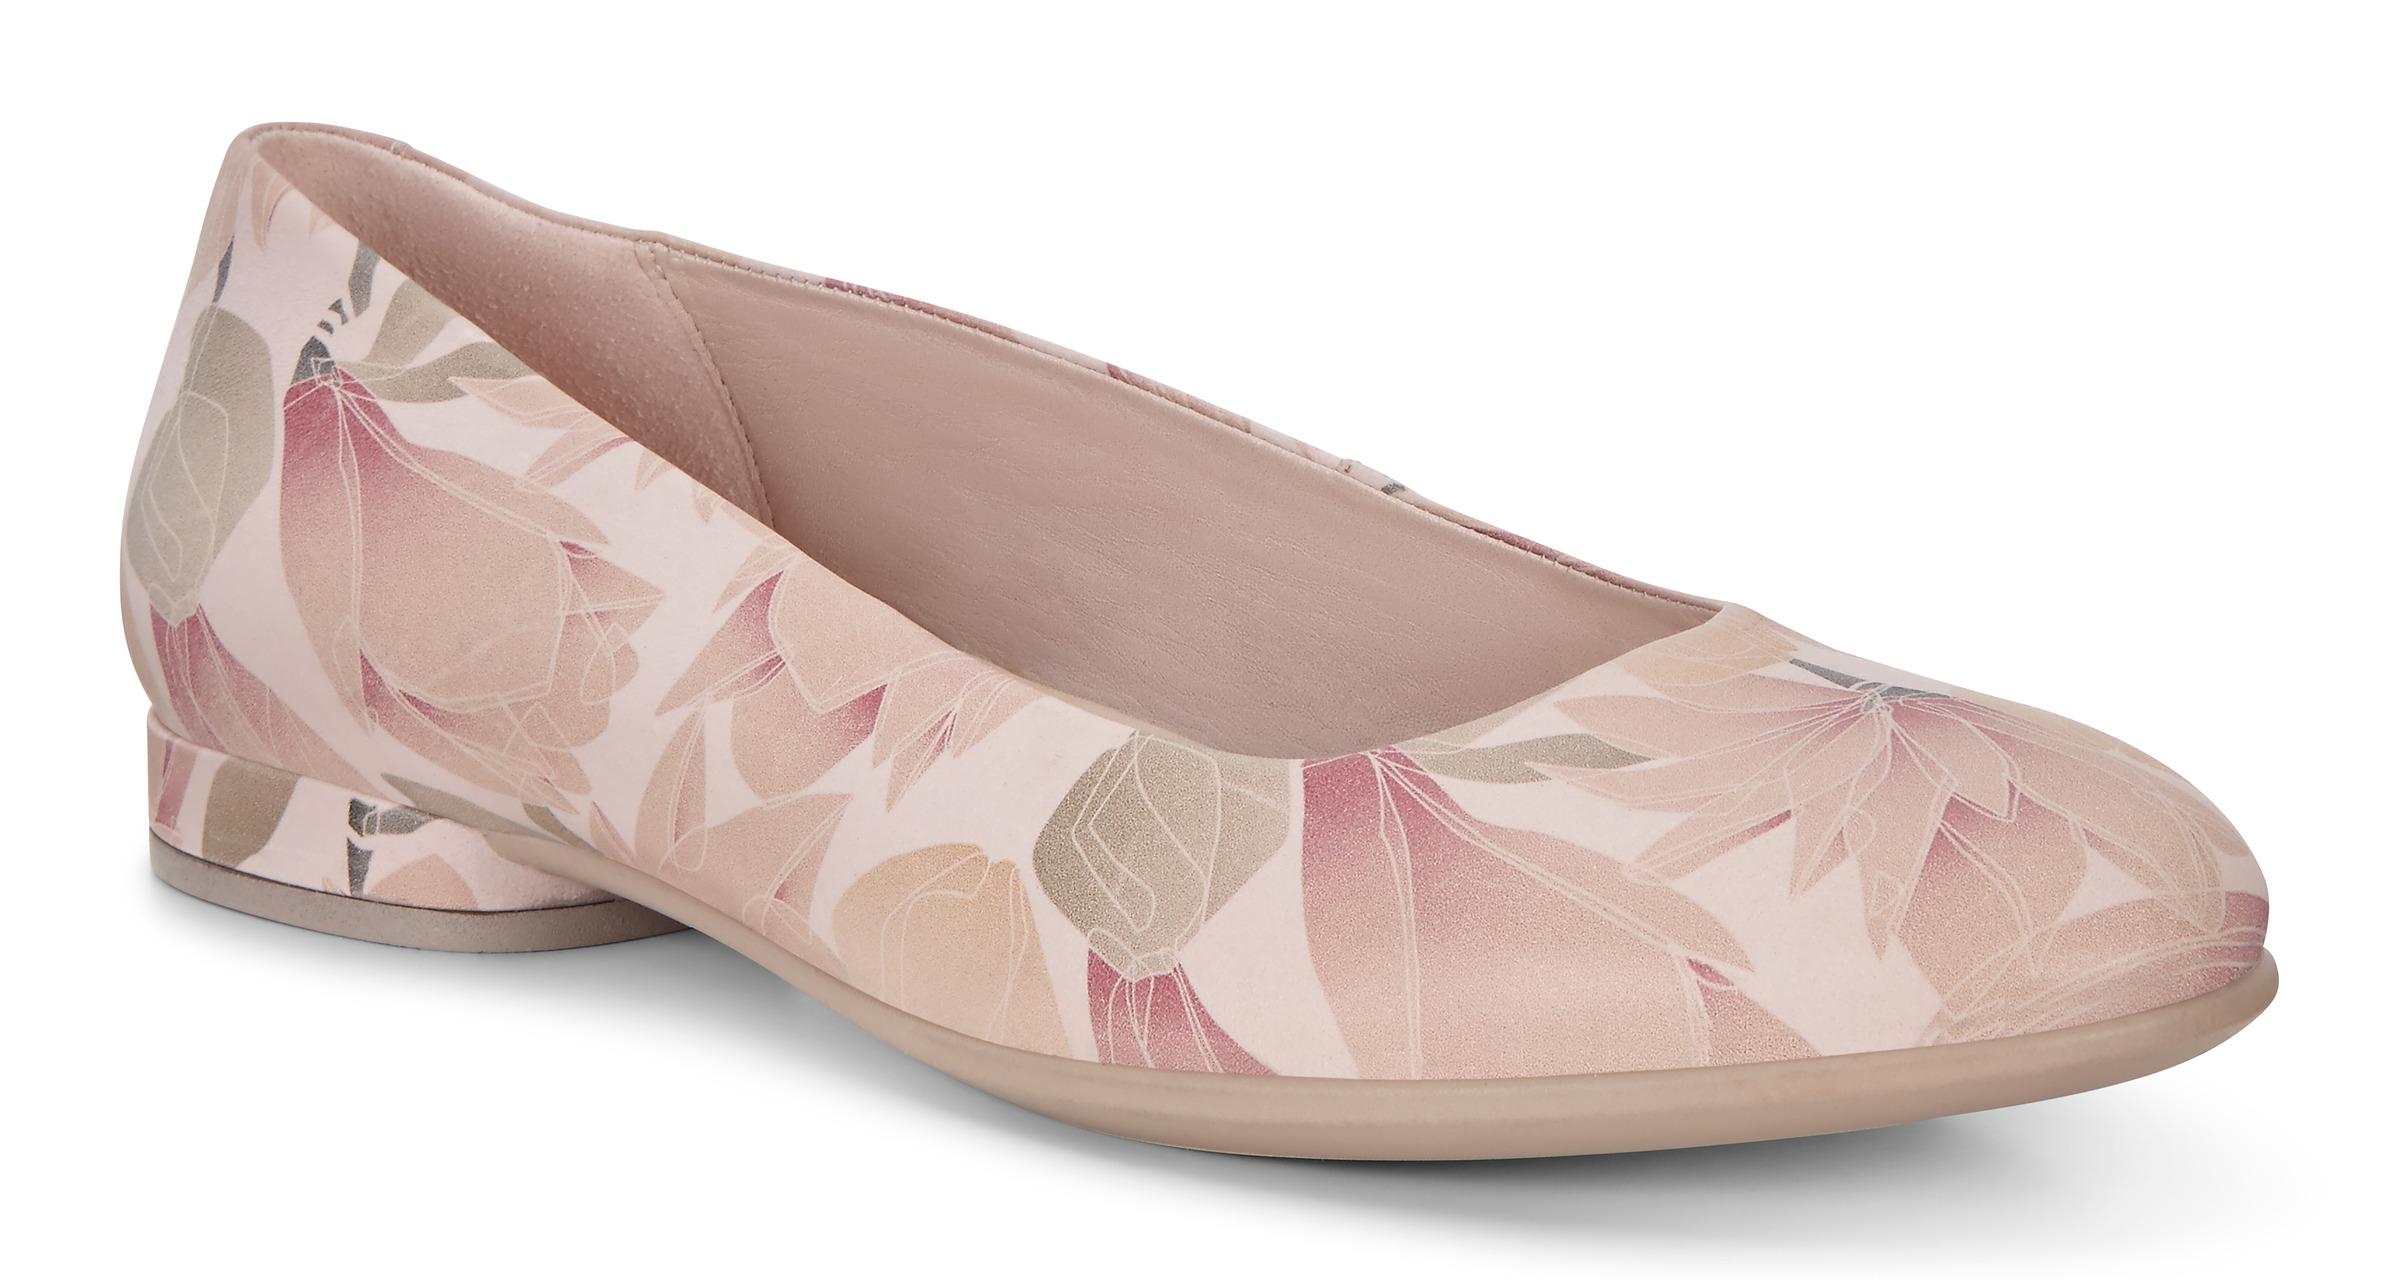 ANINE女鞋 NT. 5,380